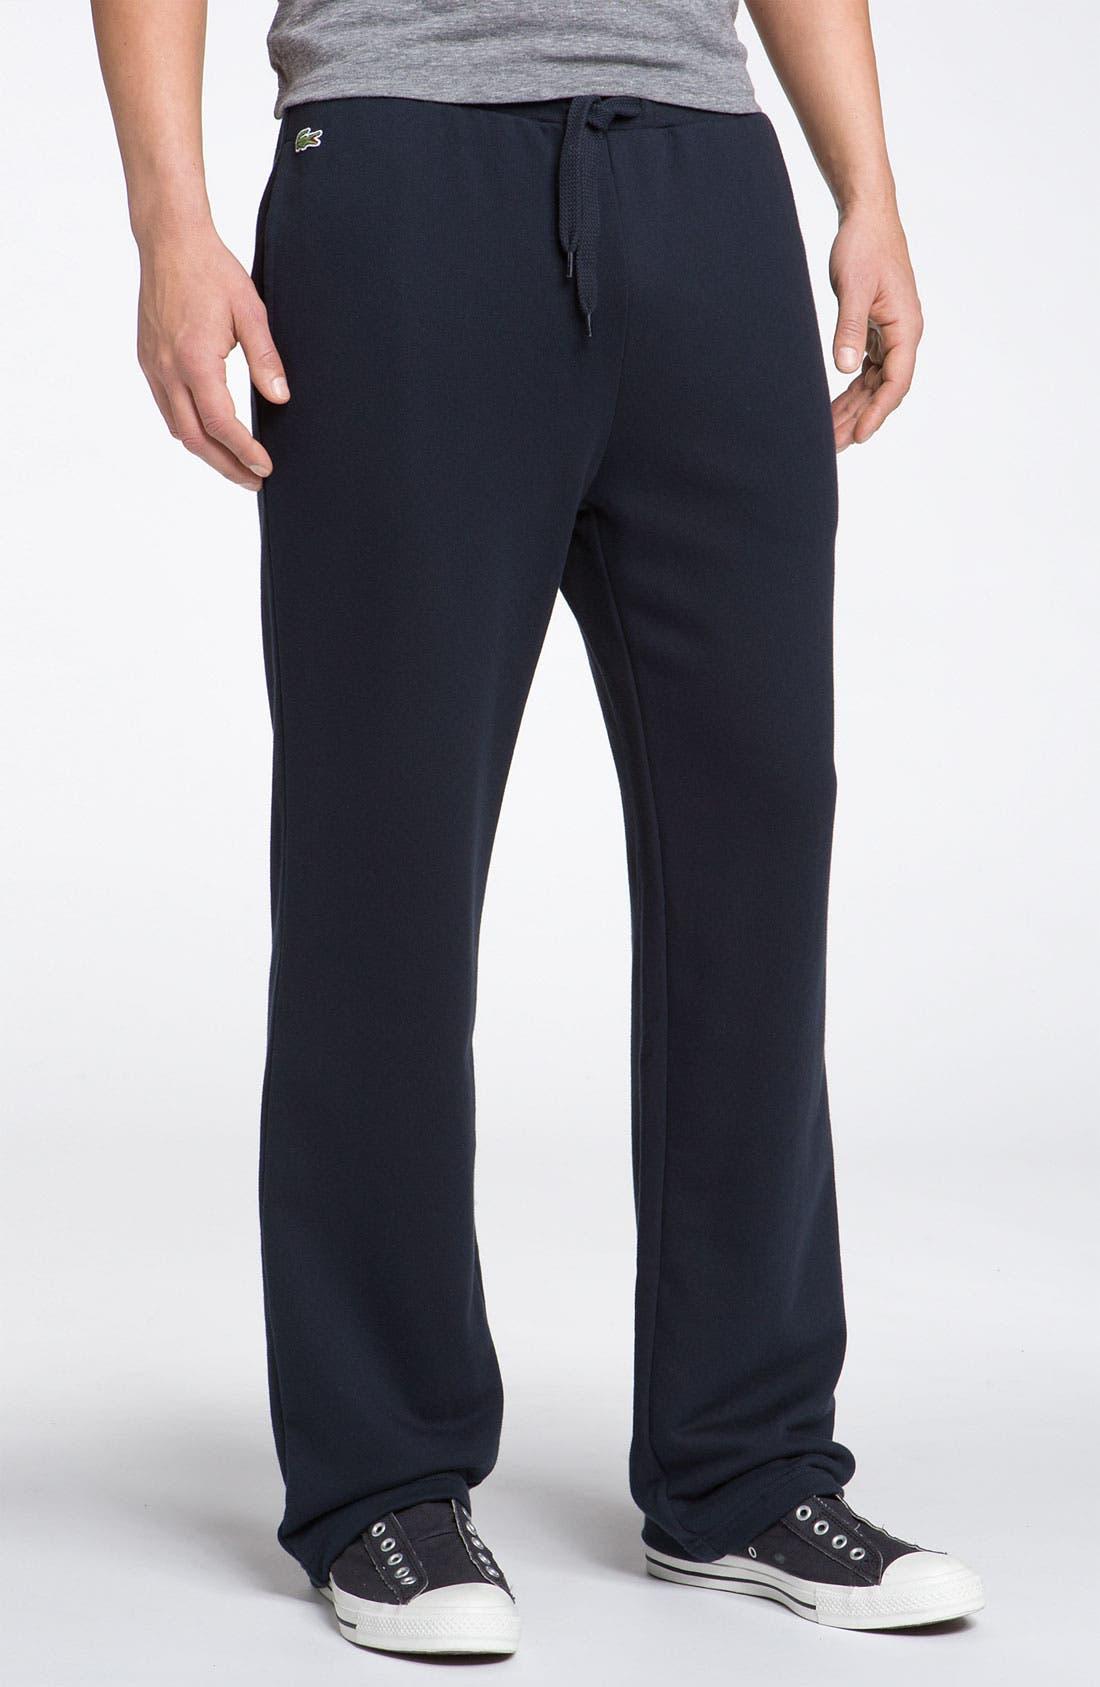 Alternate Image 1 Selected - Lacoste Fleece Track Pants